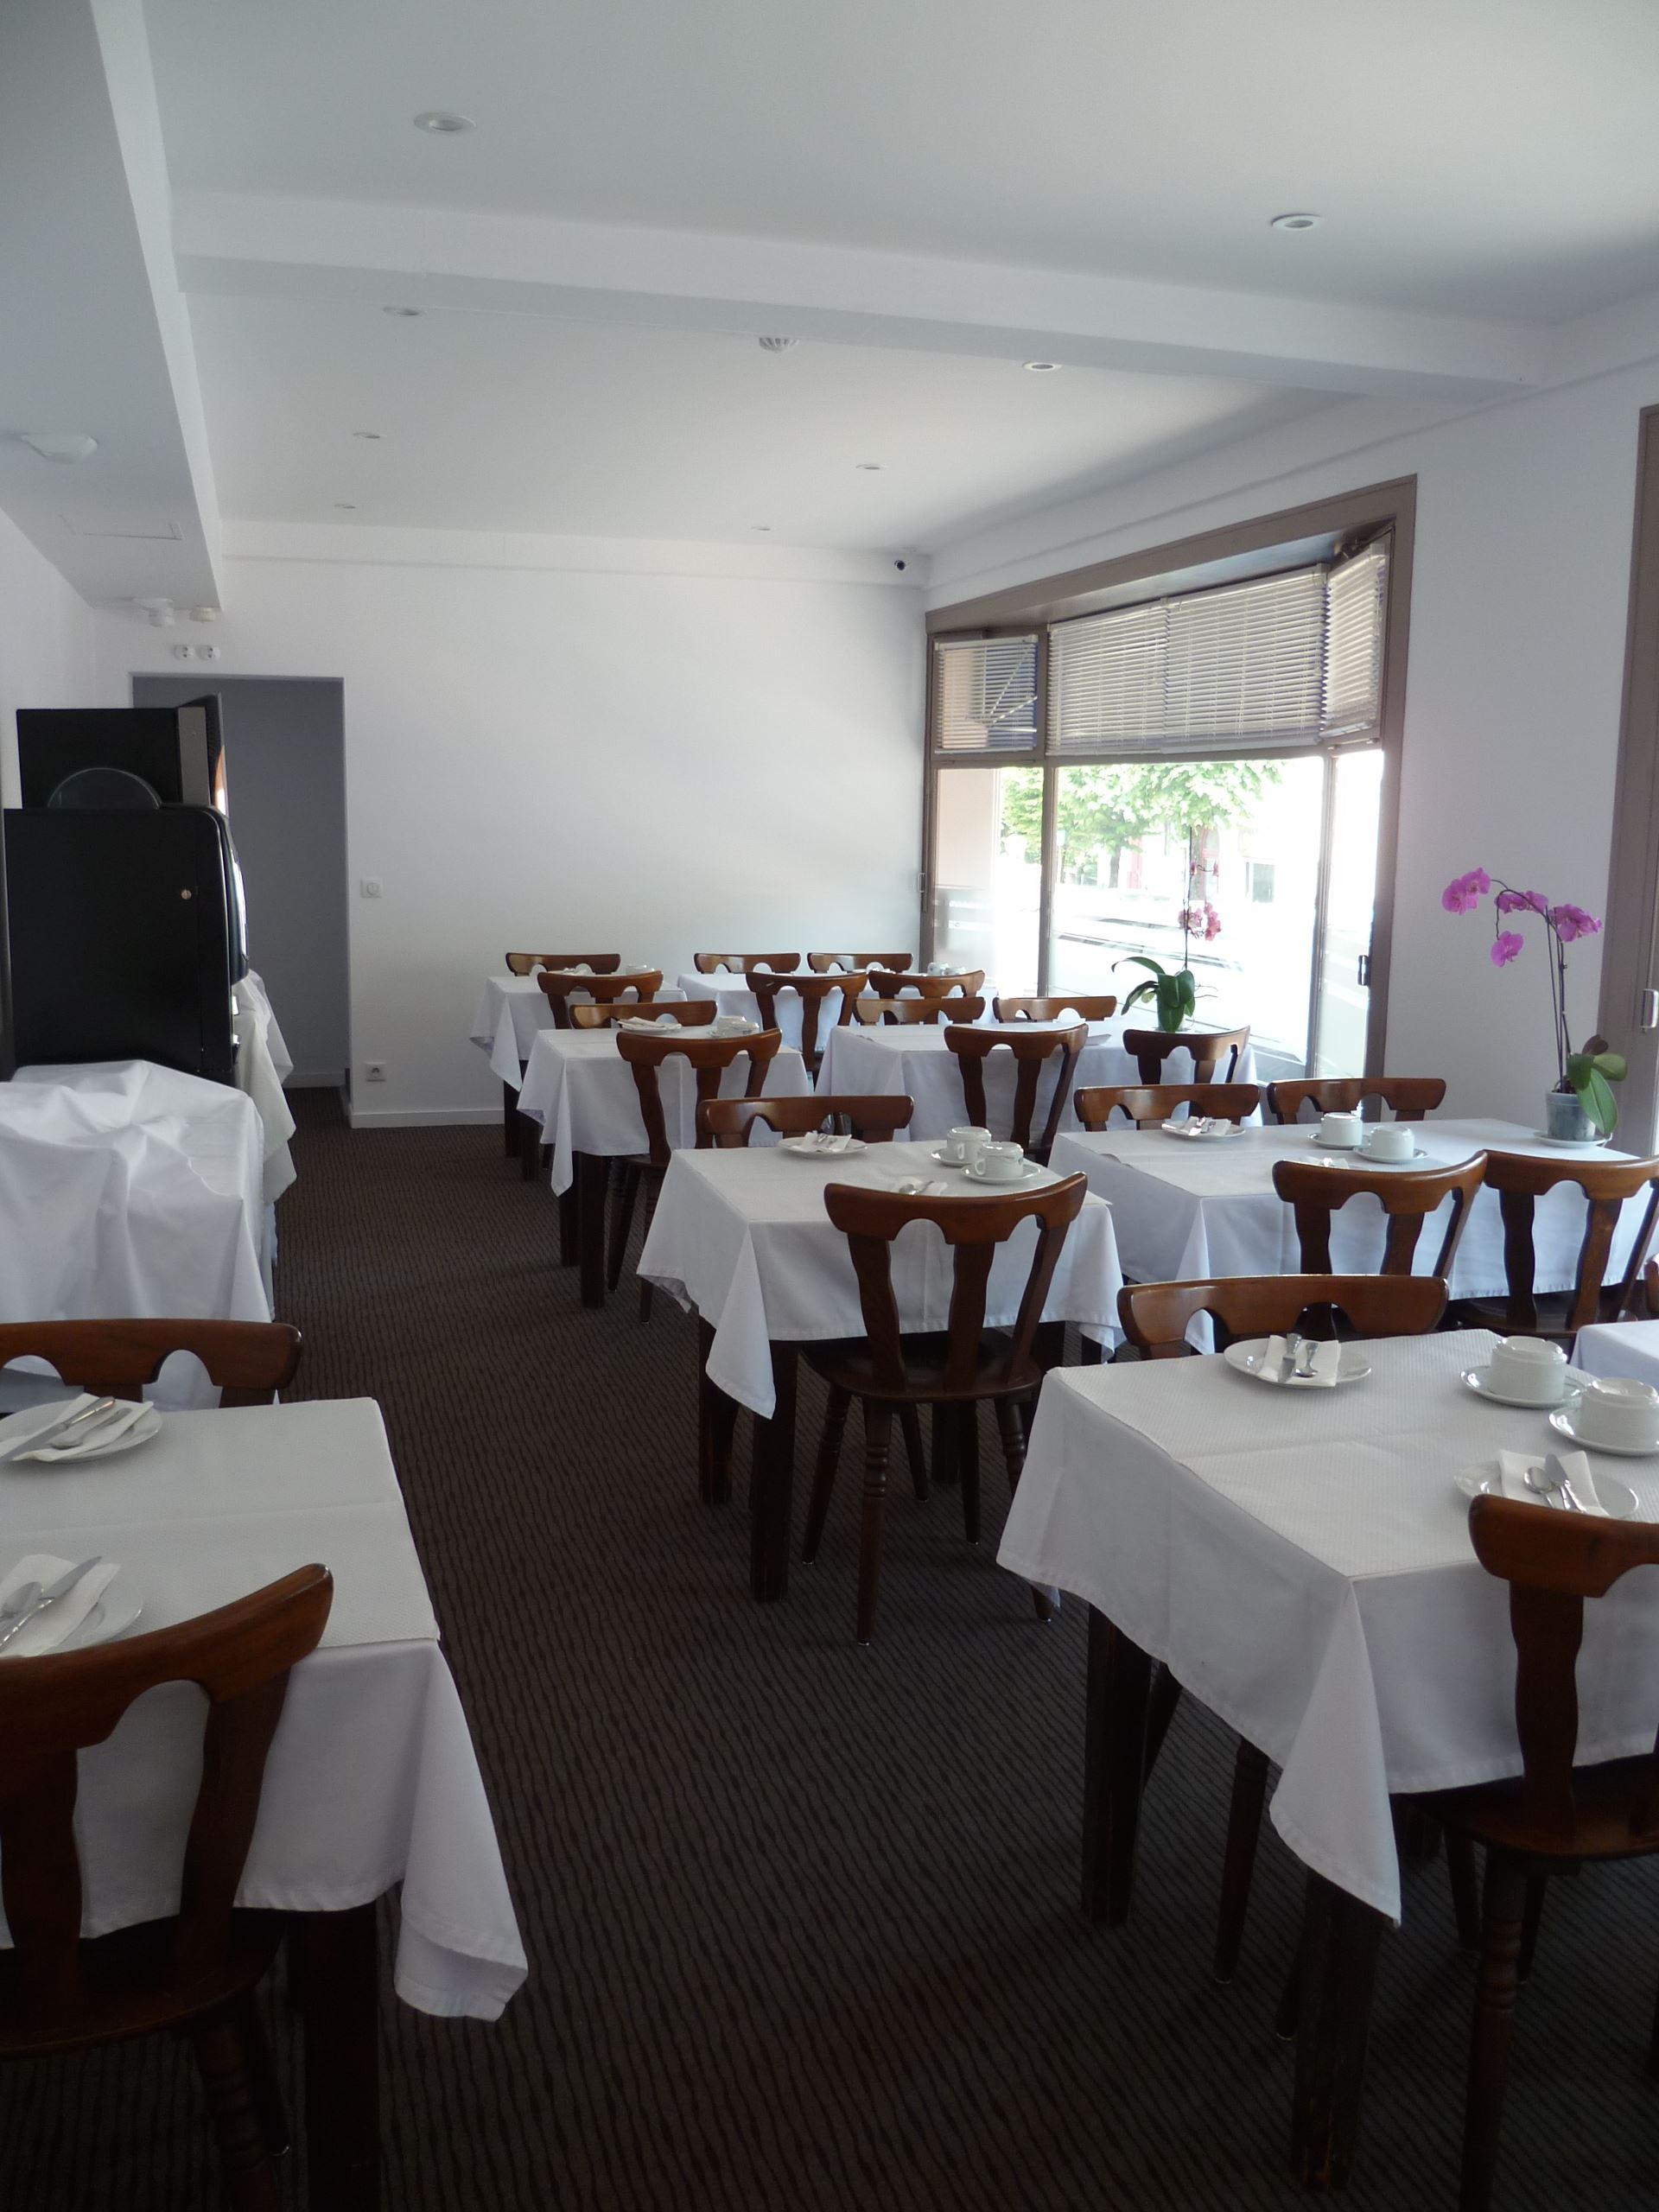 Hôtel Txutxu-Mutxu